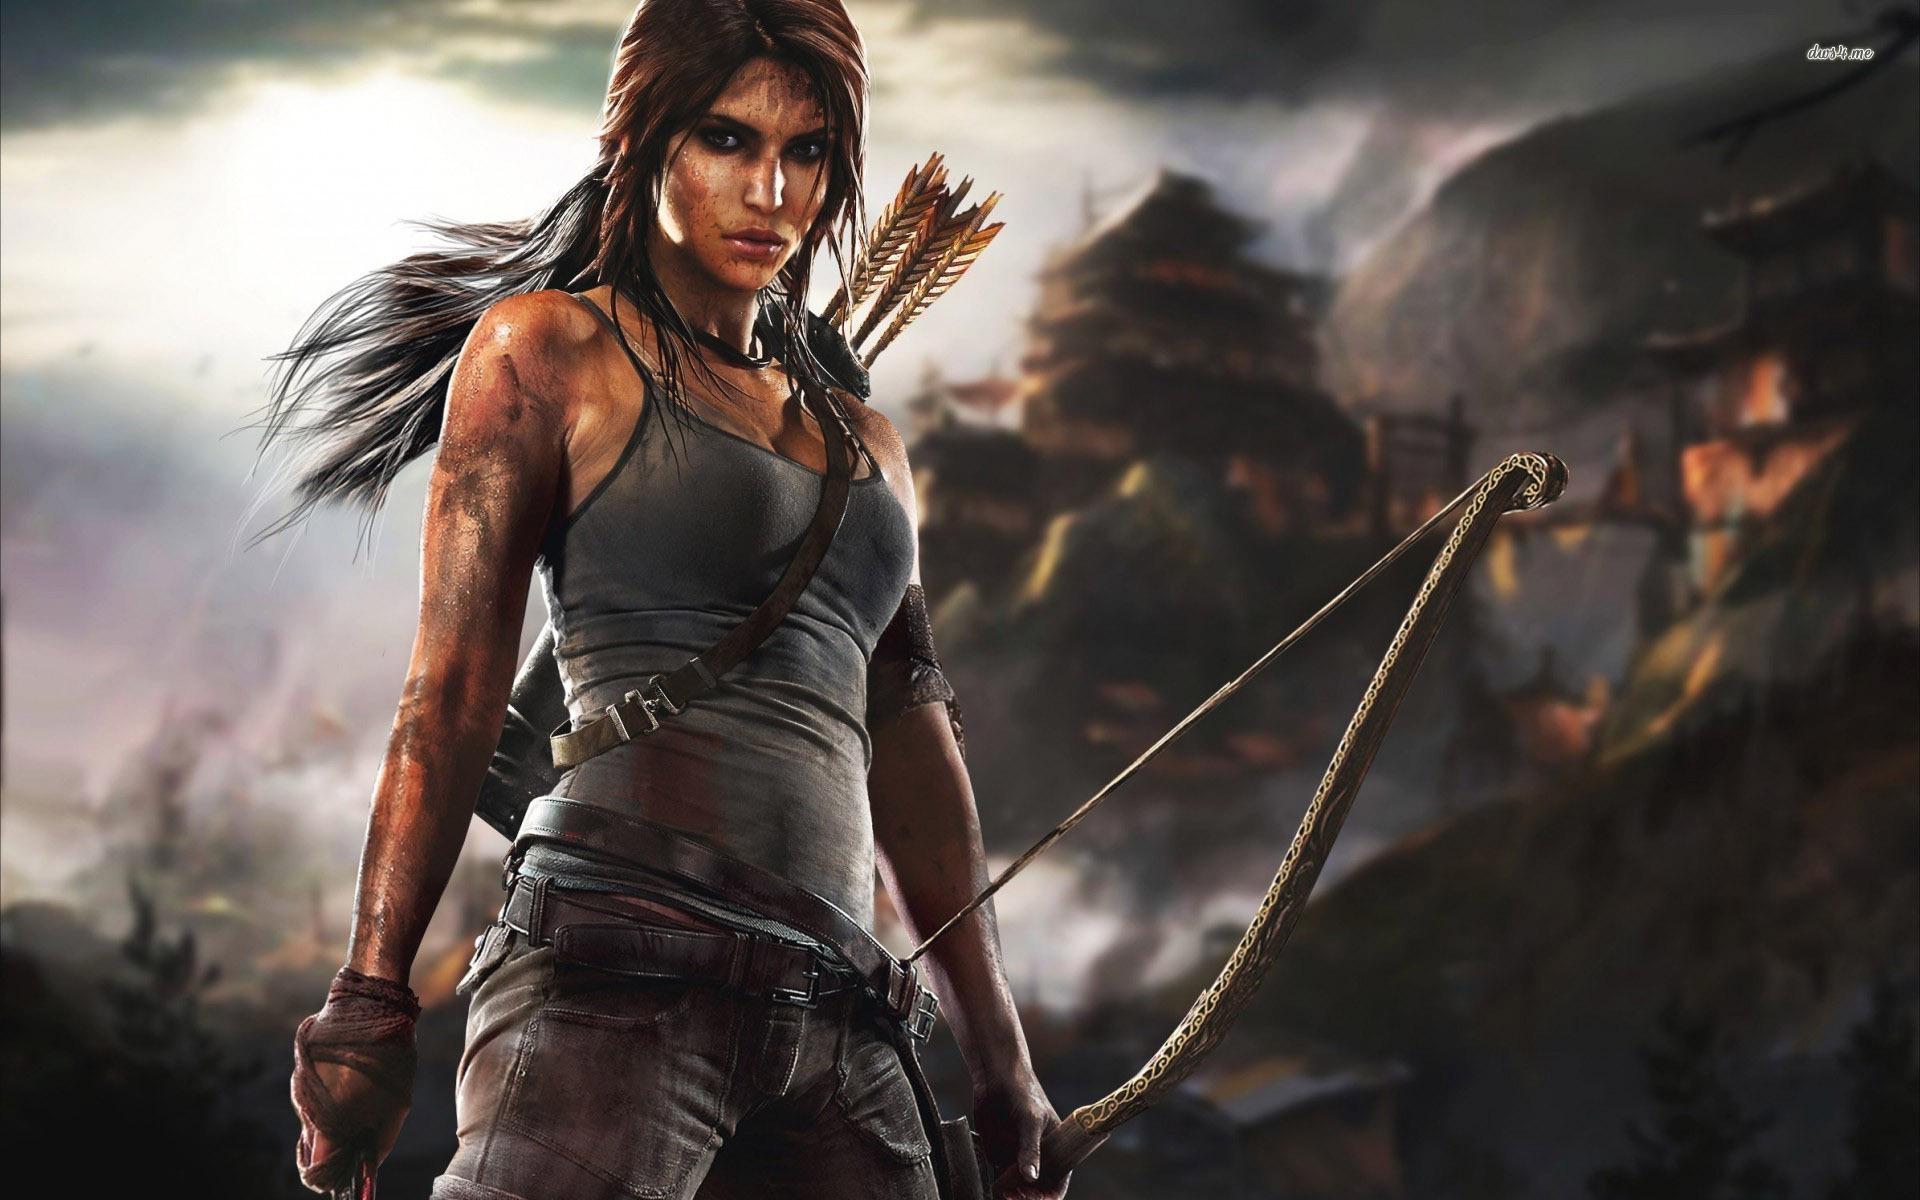 Free Download Lara Croft Tomb Raider Wallpaper Game Wallpapers